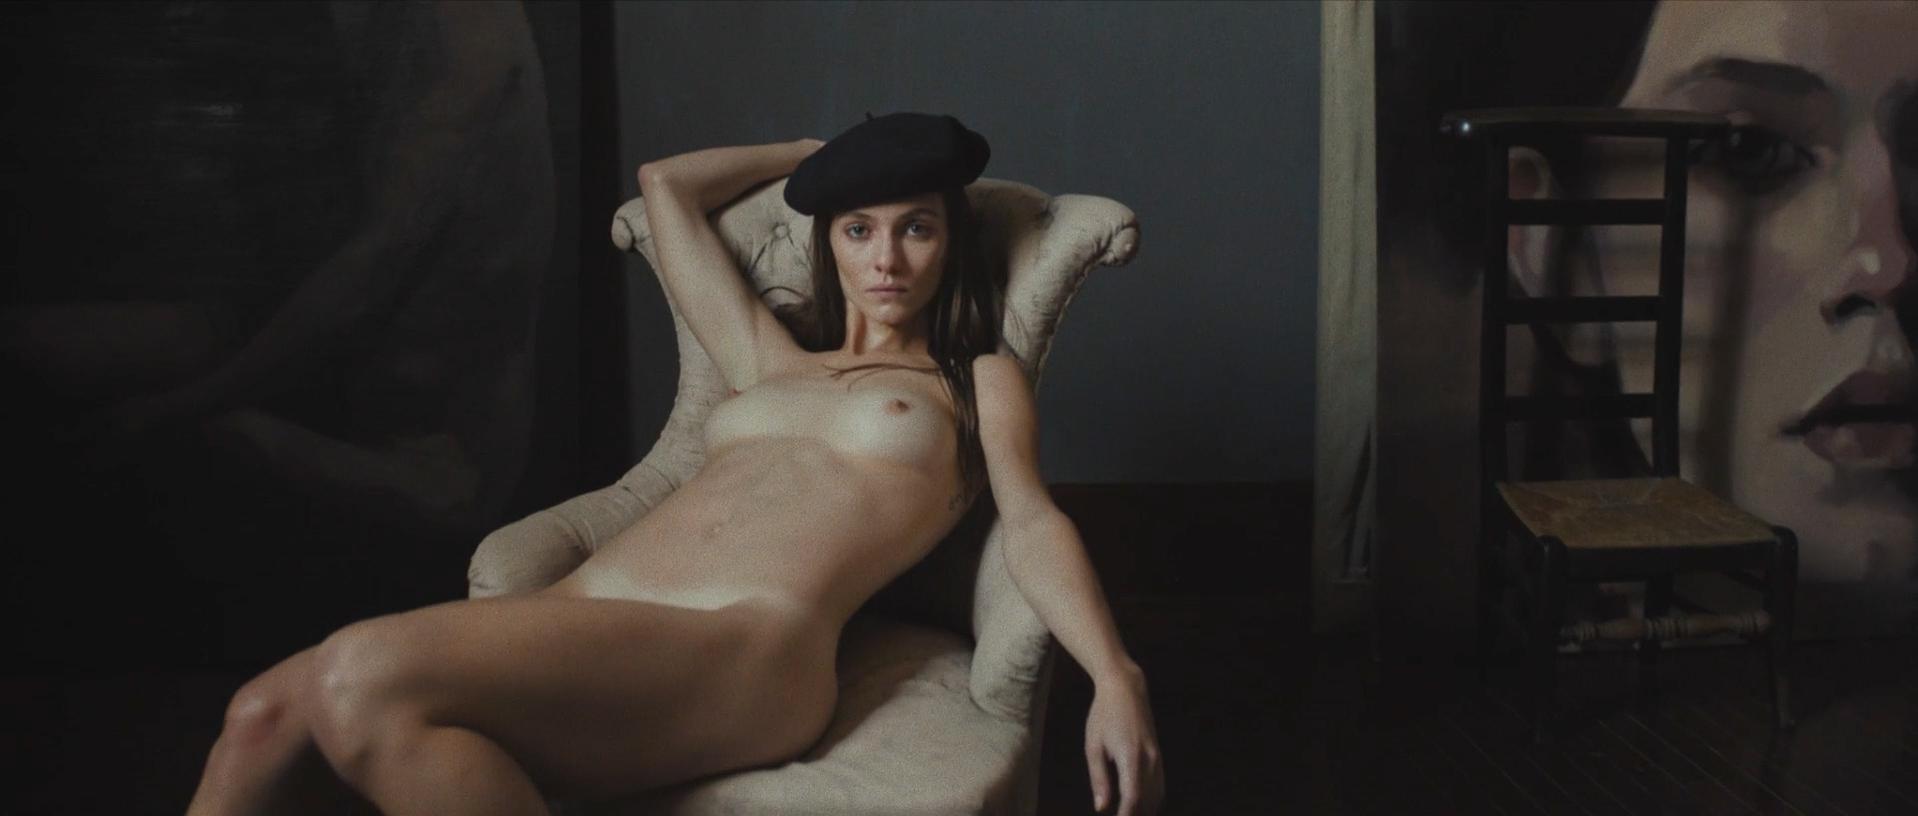 Salome Zimmerlin nude - La Fille d'Herode (2016)